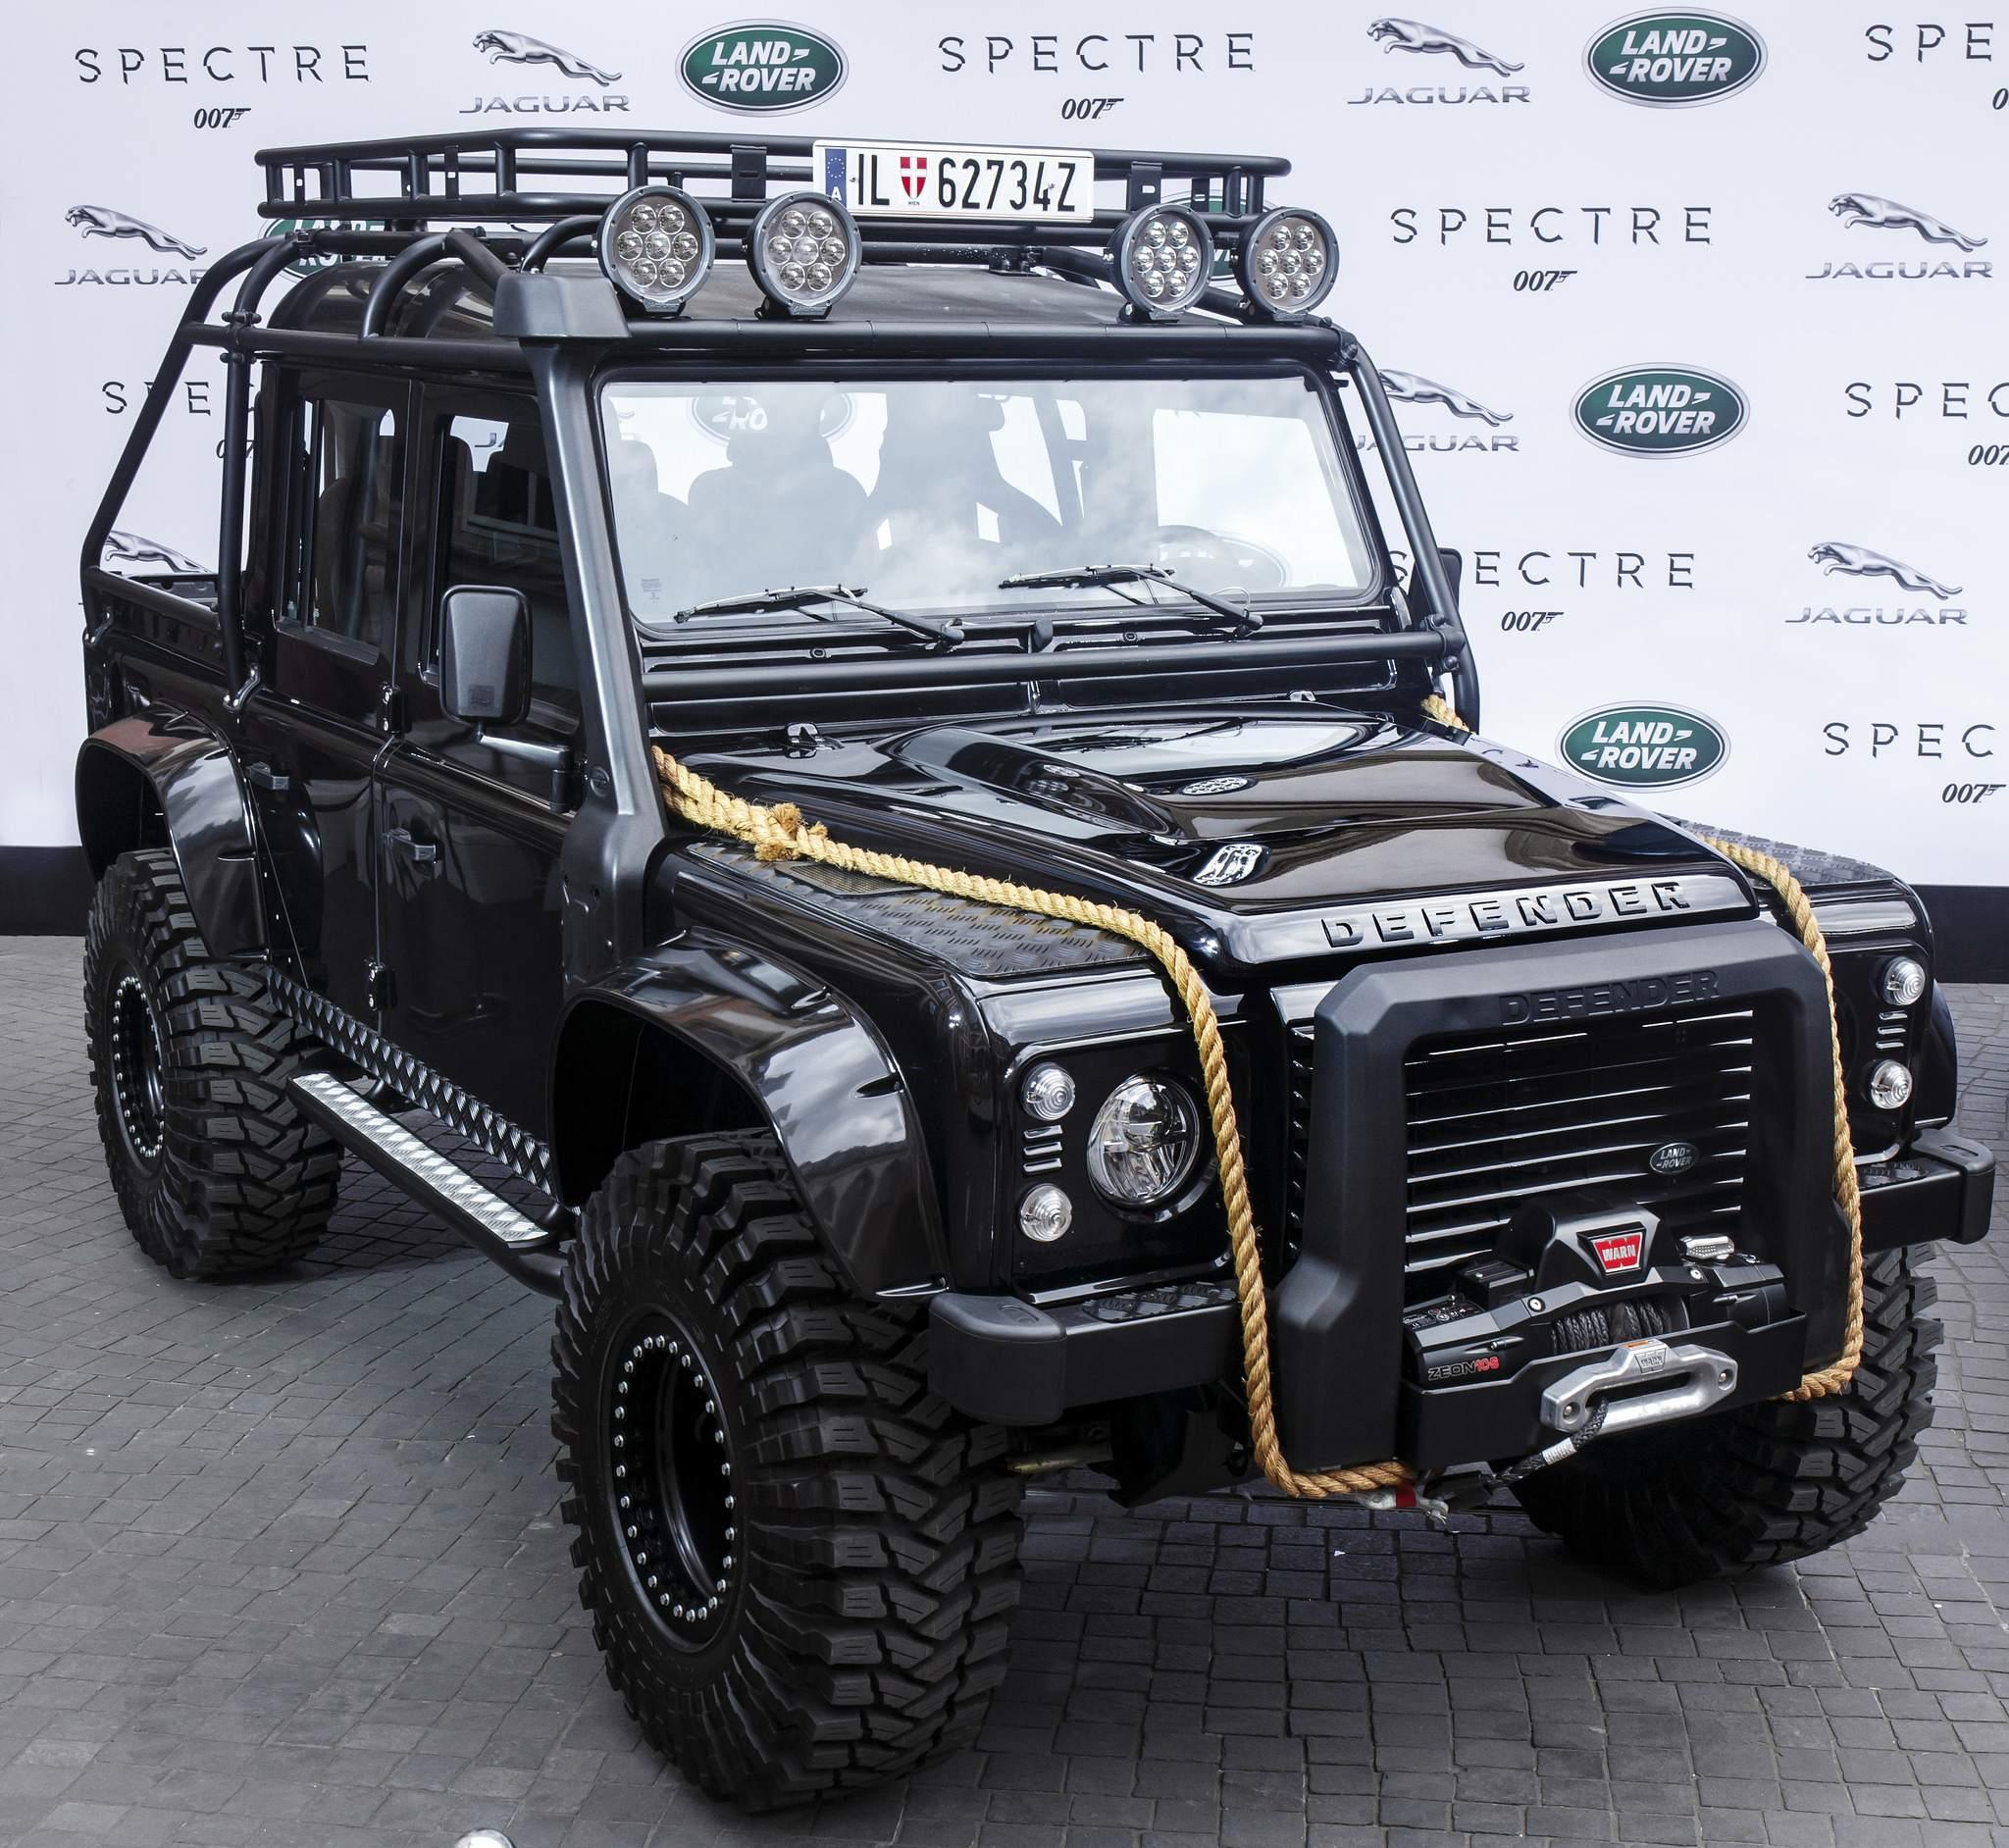 spectre car9 Jaguar Land Rover Latest Bond Cars